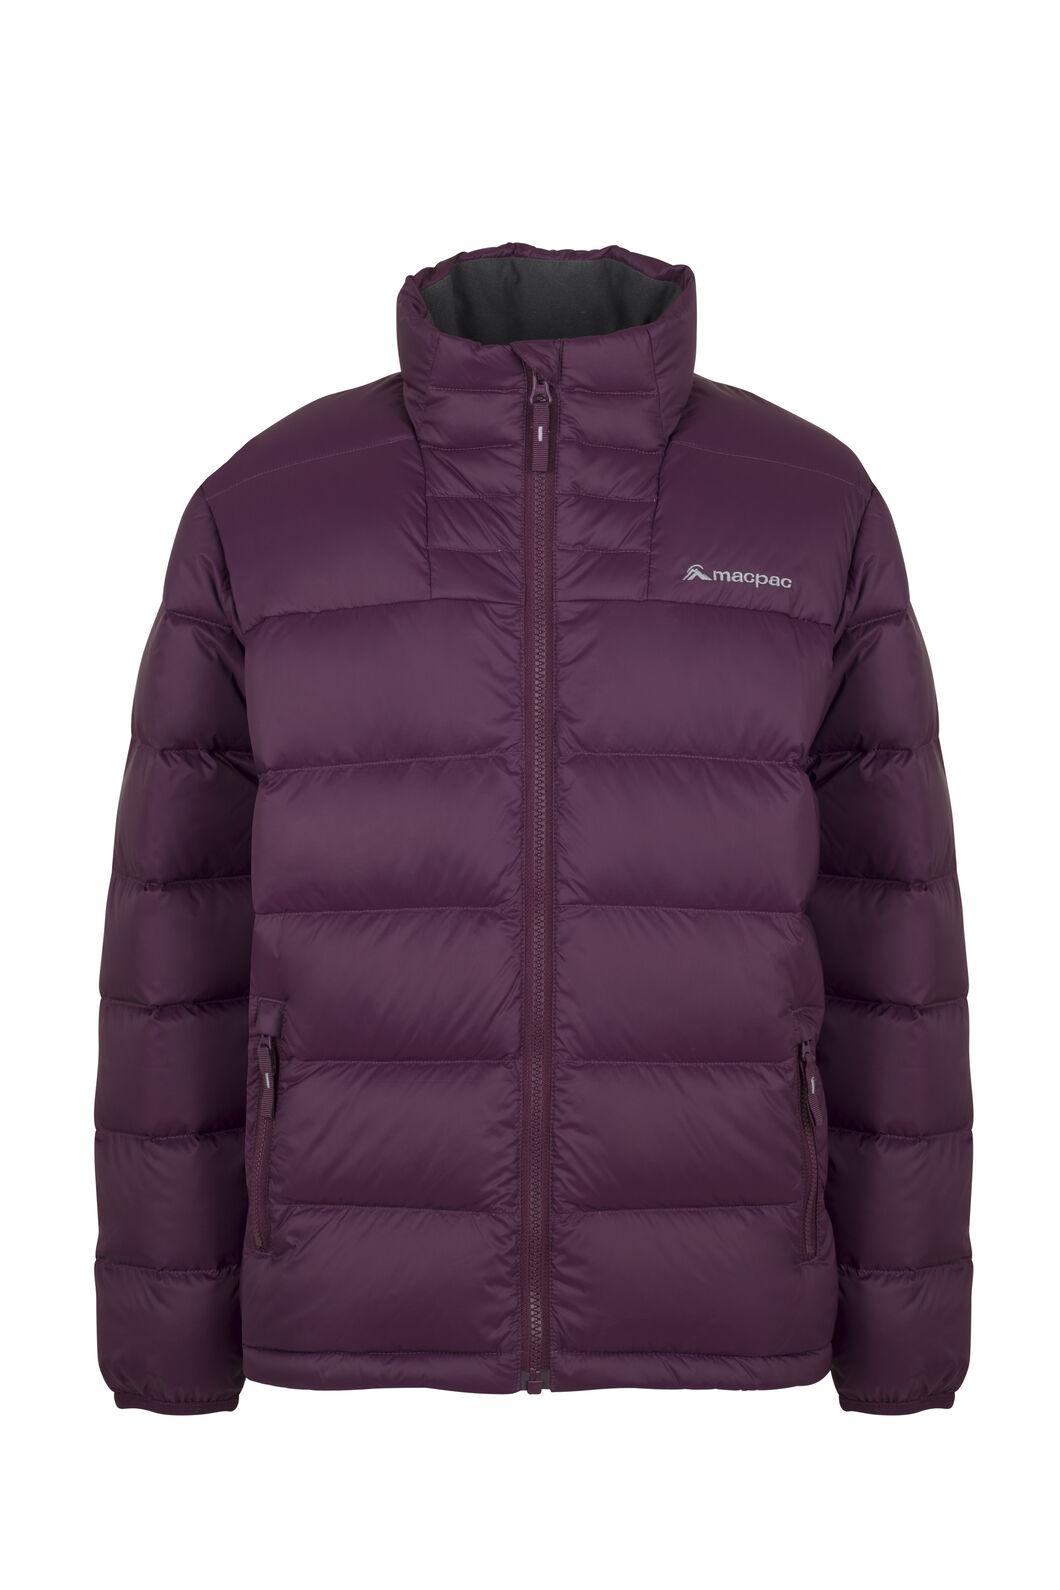 Macpac Atom Down Jacket - Kids', Potent Purple, hi-res